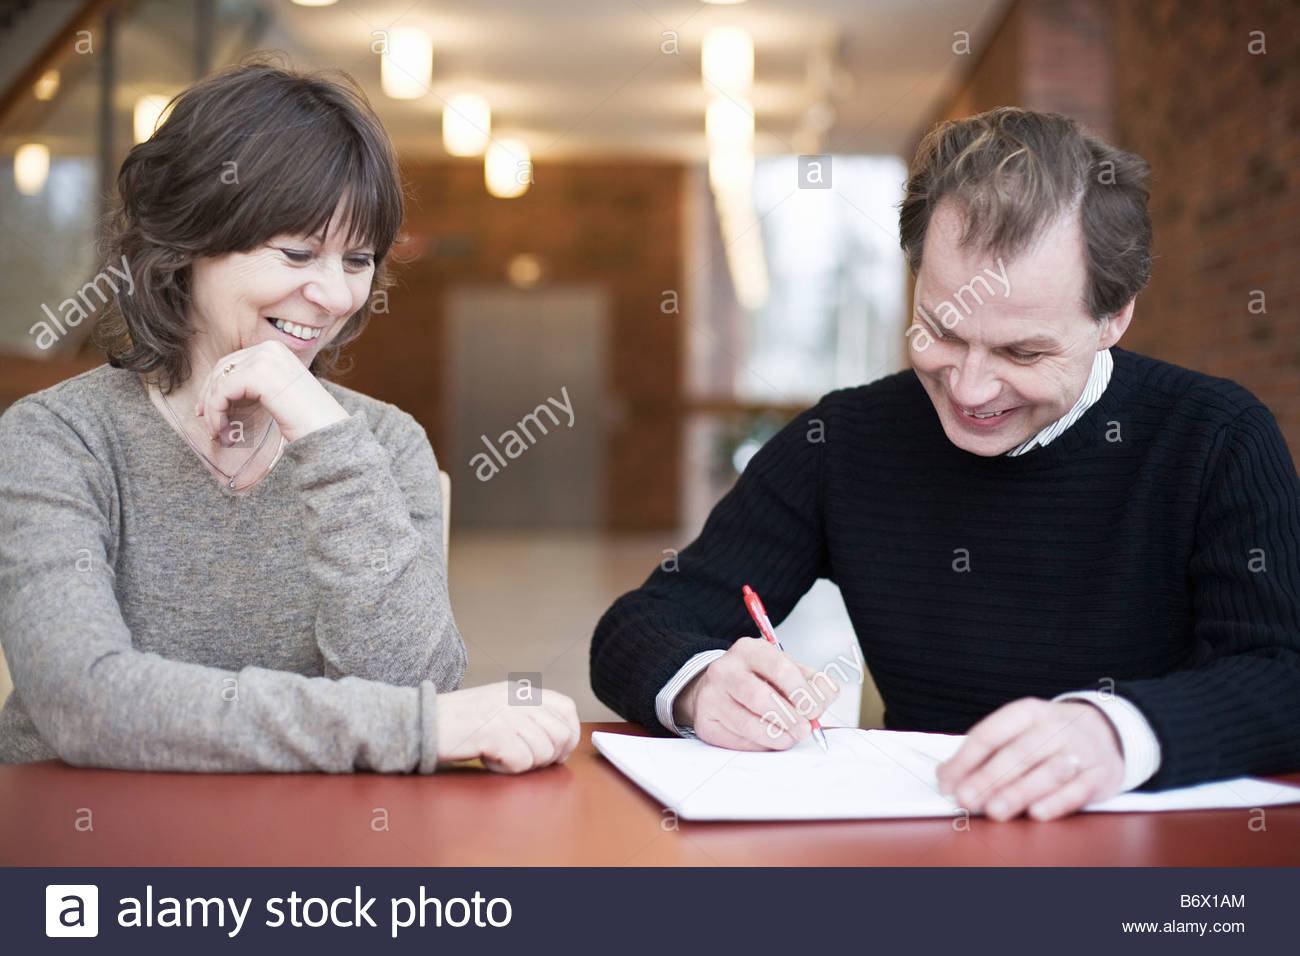 Woman and man talking - Stock Image